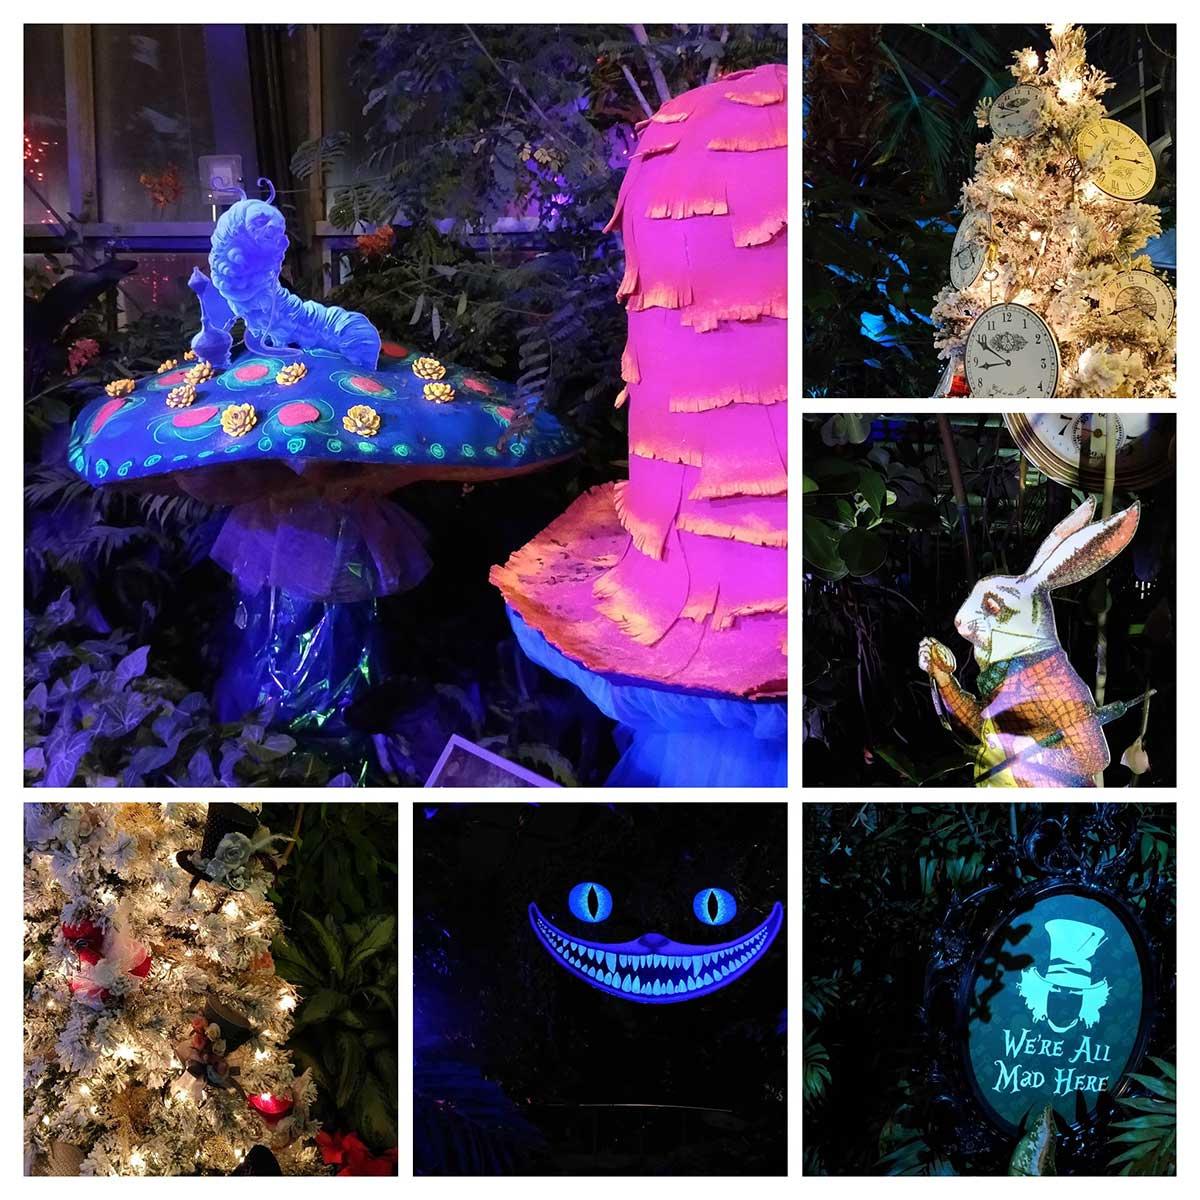 Calgary Zoo Lights Alice in Wonderland